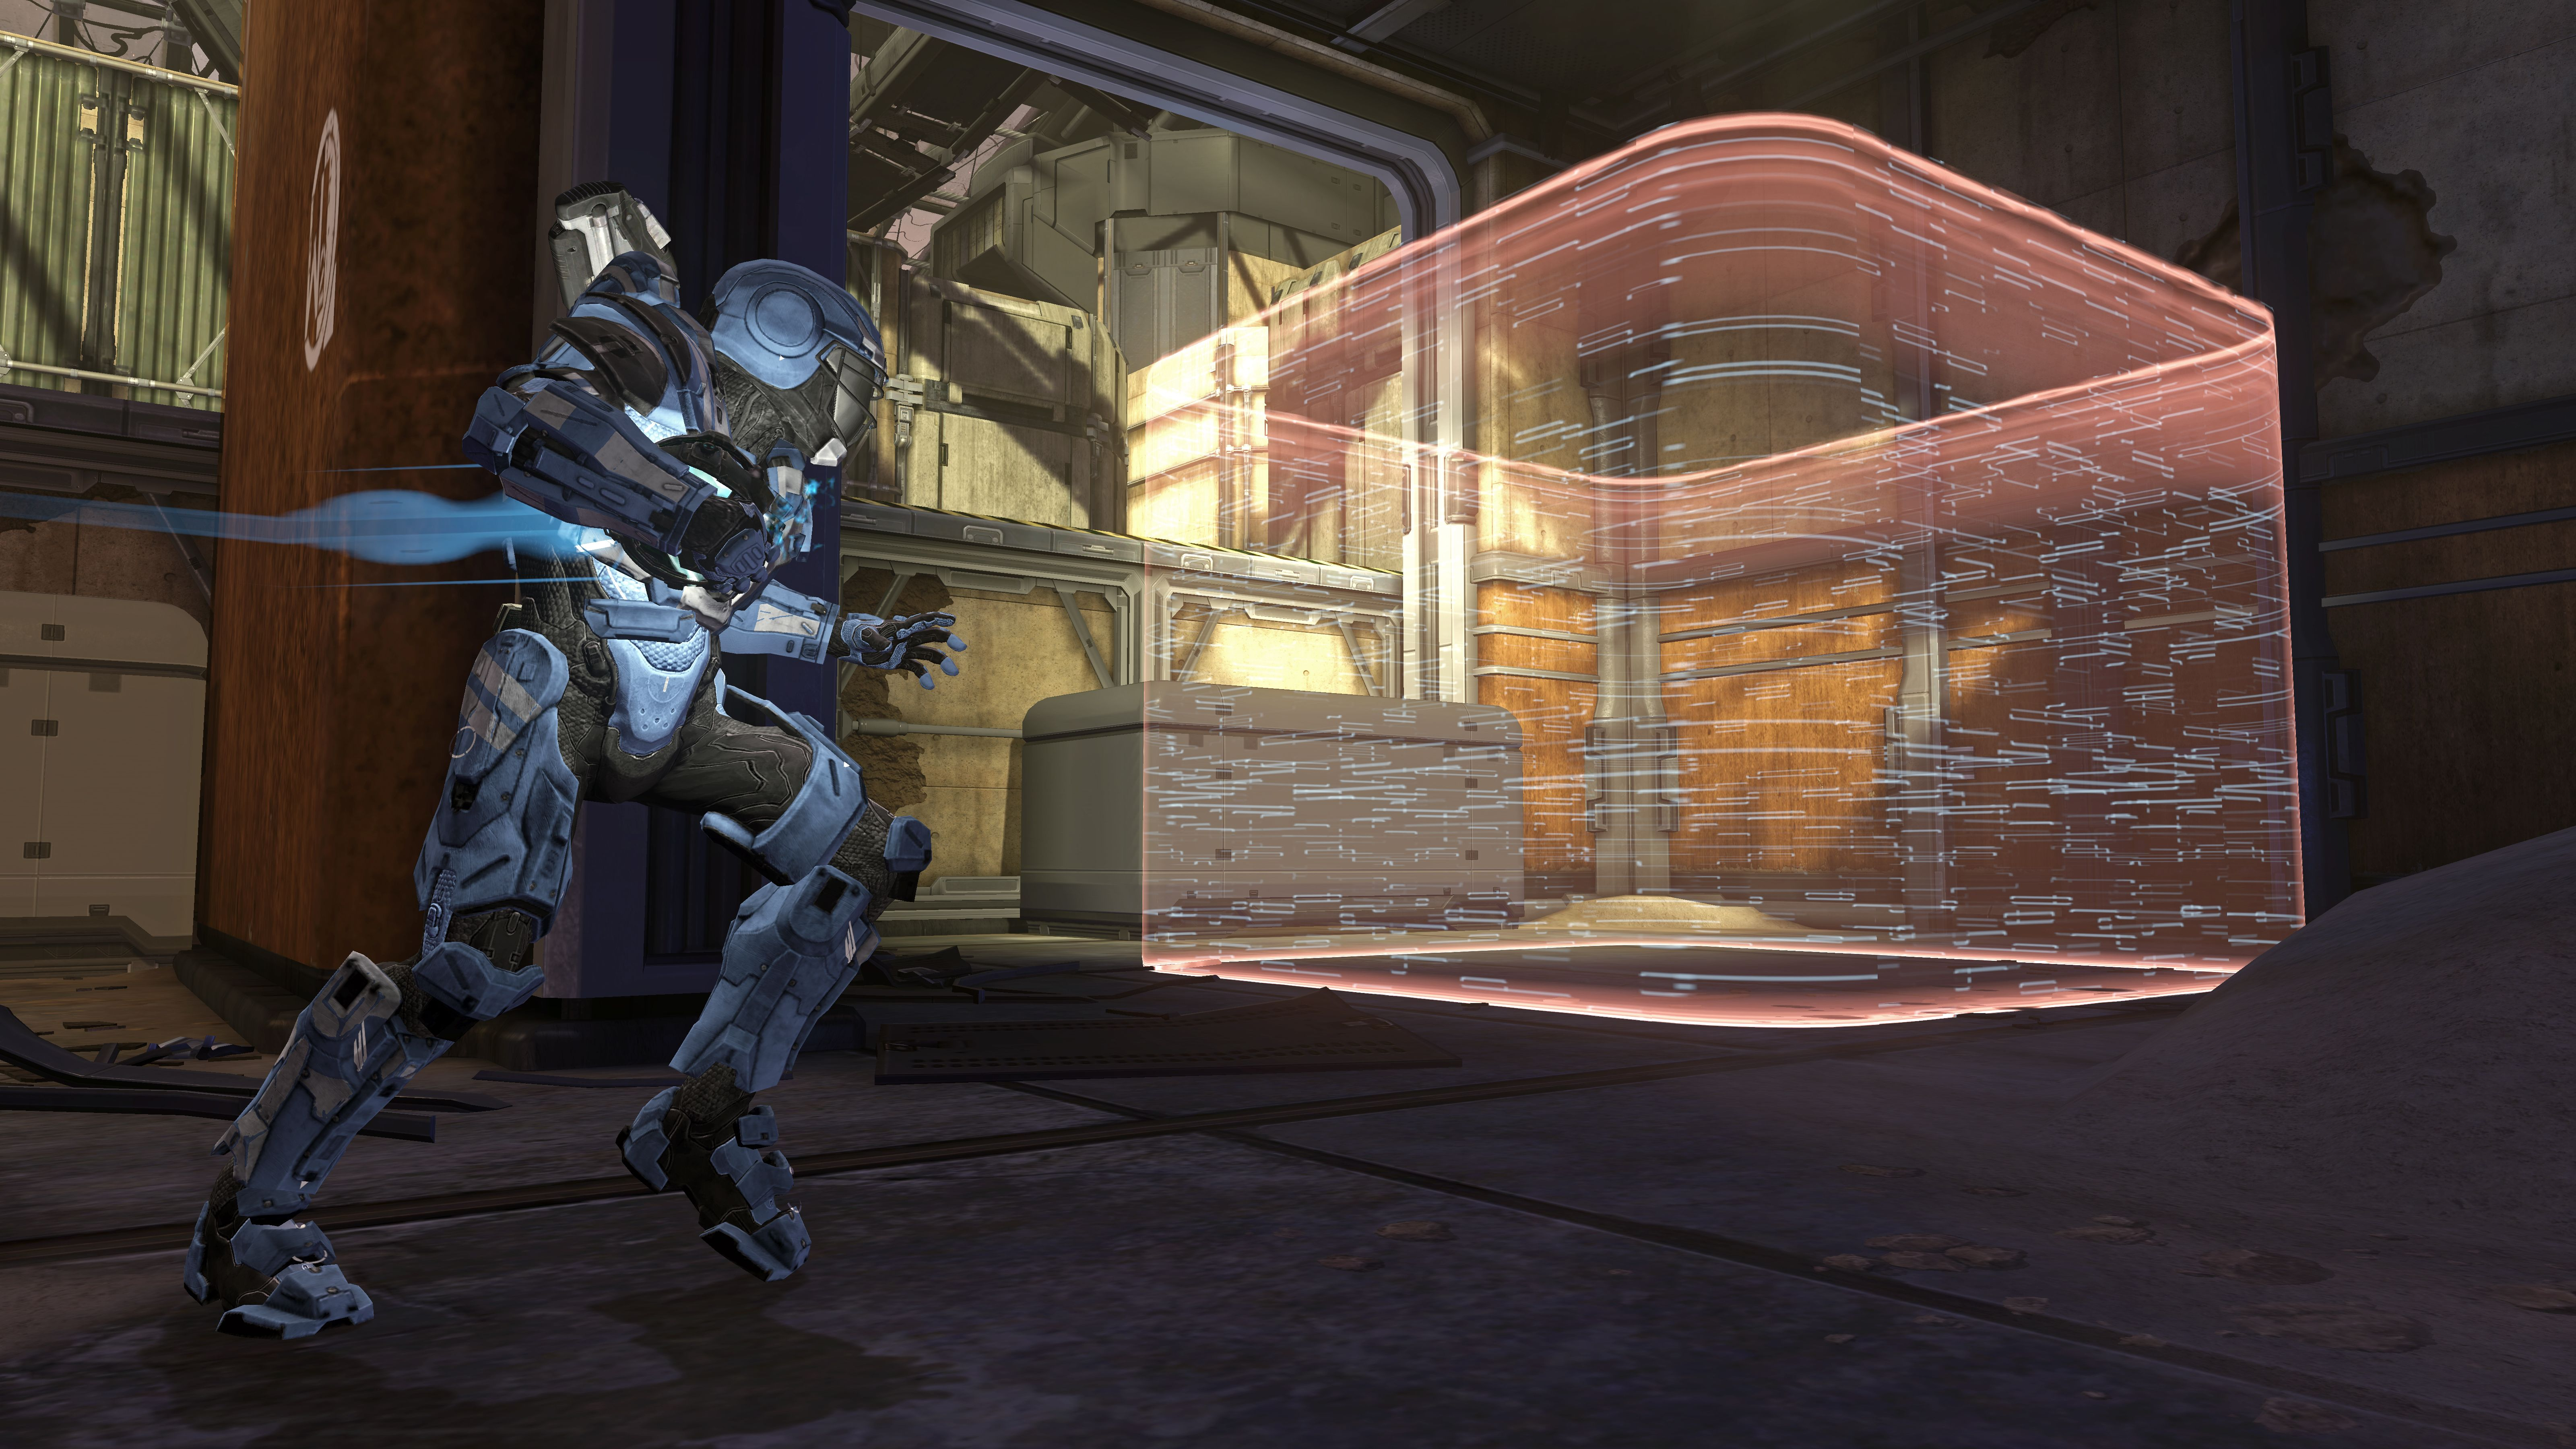 Halo 4 - Halo 4 6K